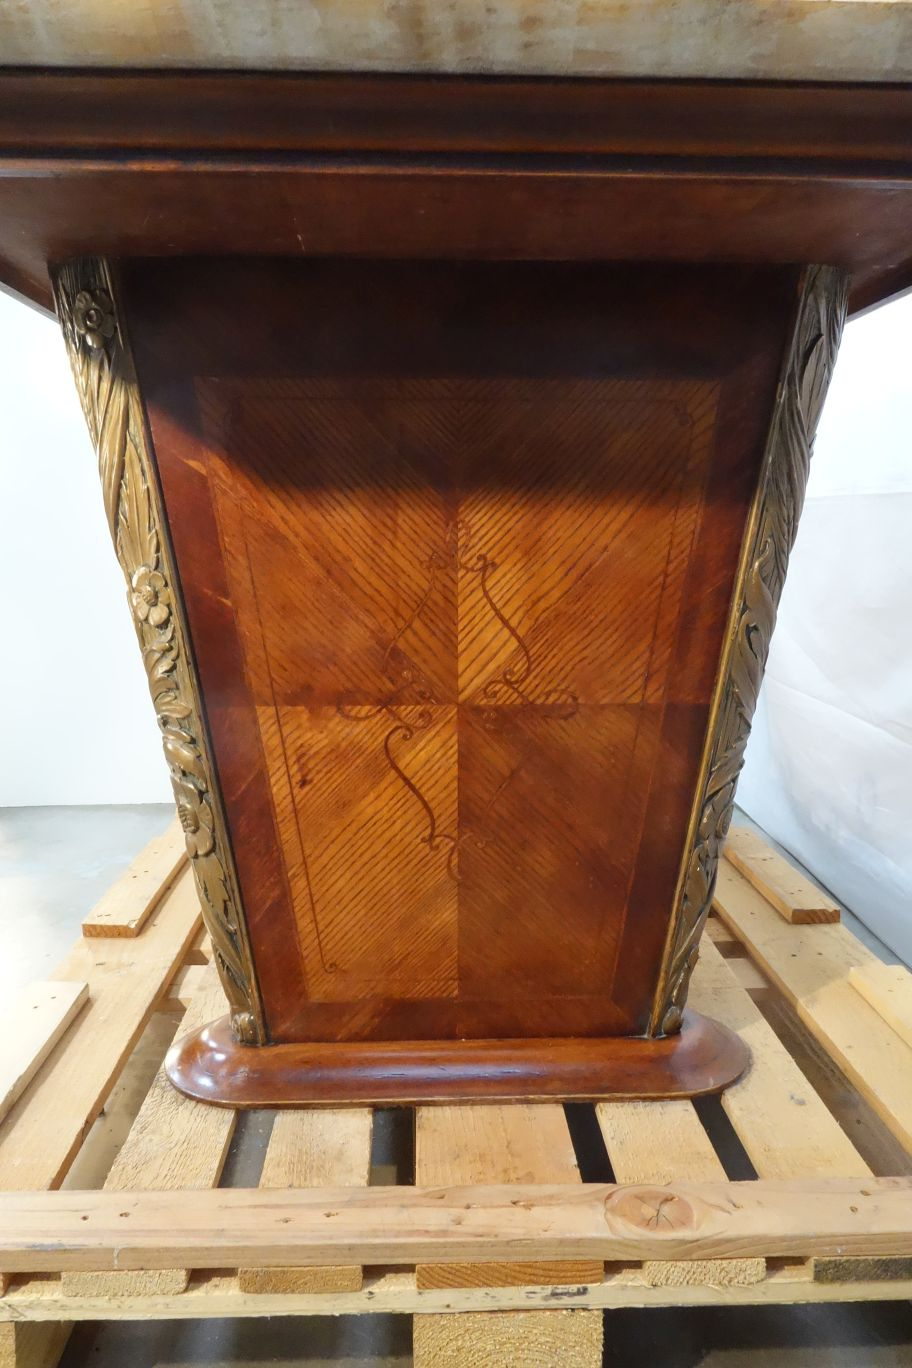 Italian Mid Century Formal Art Deco Walnut Table With Onyx